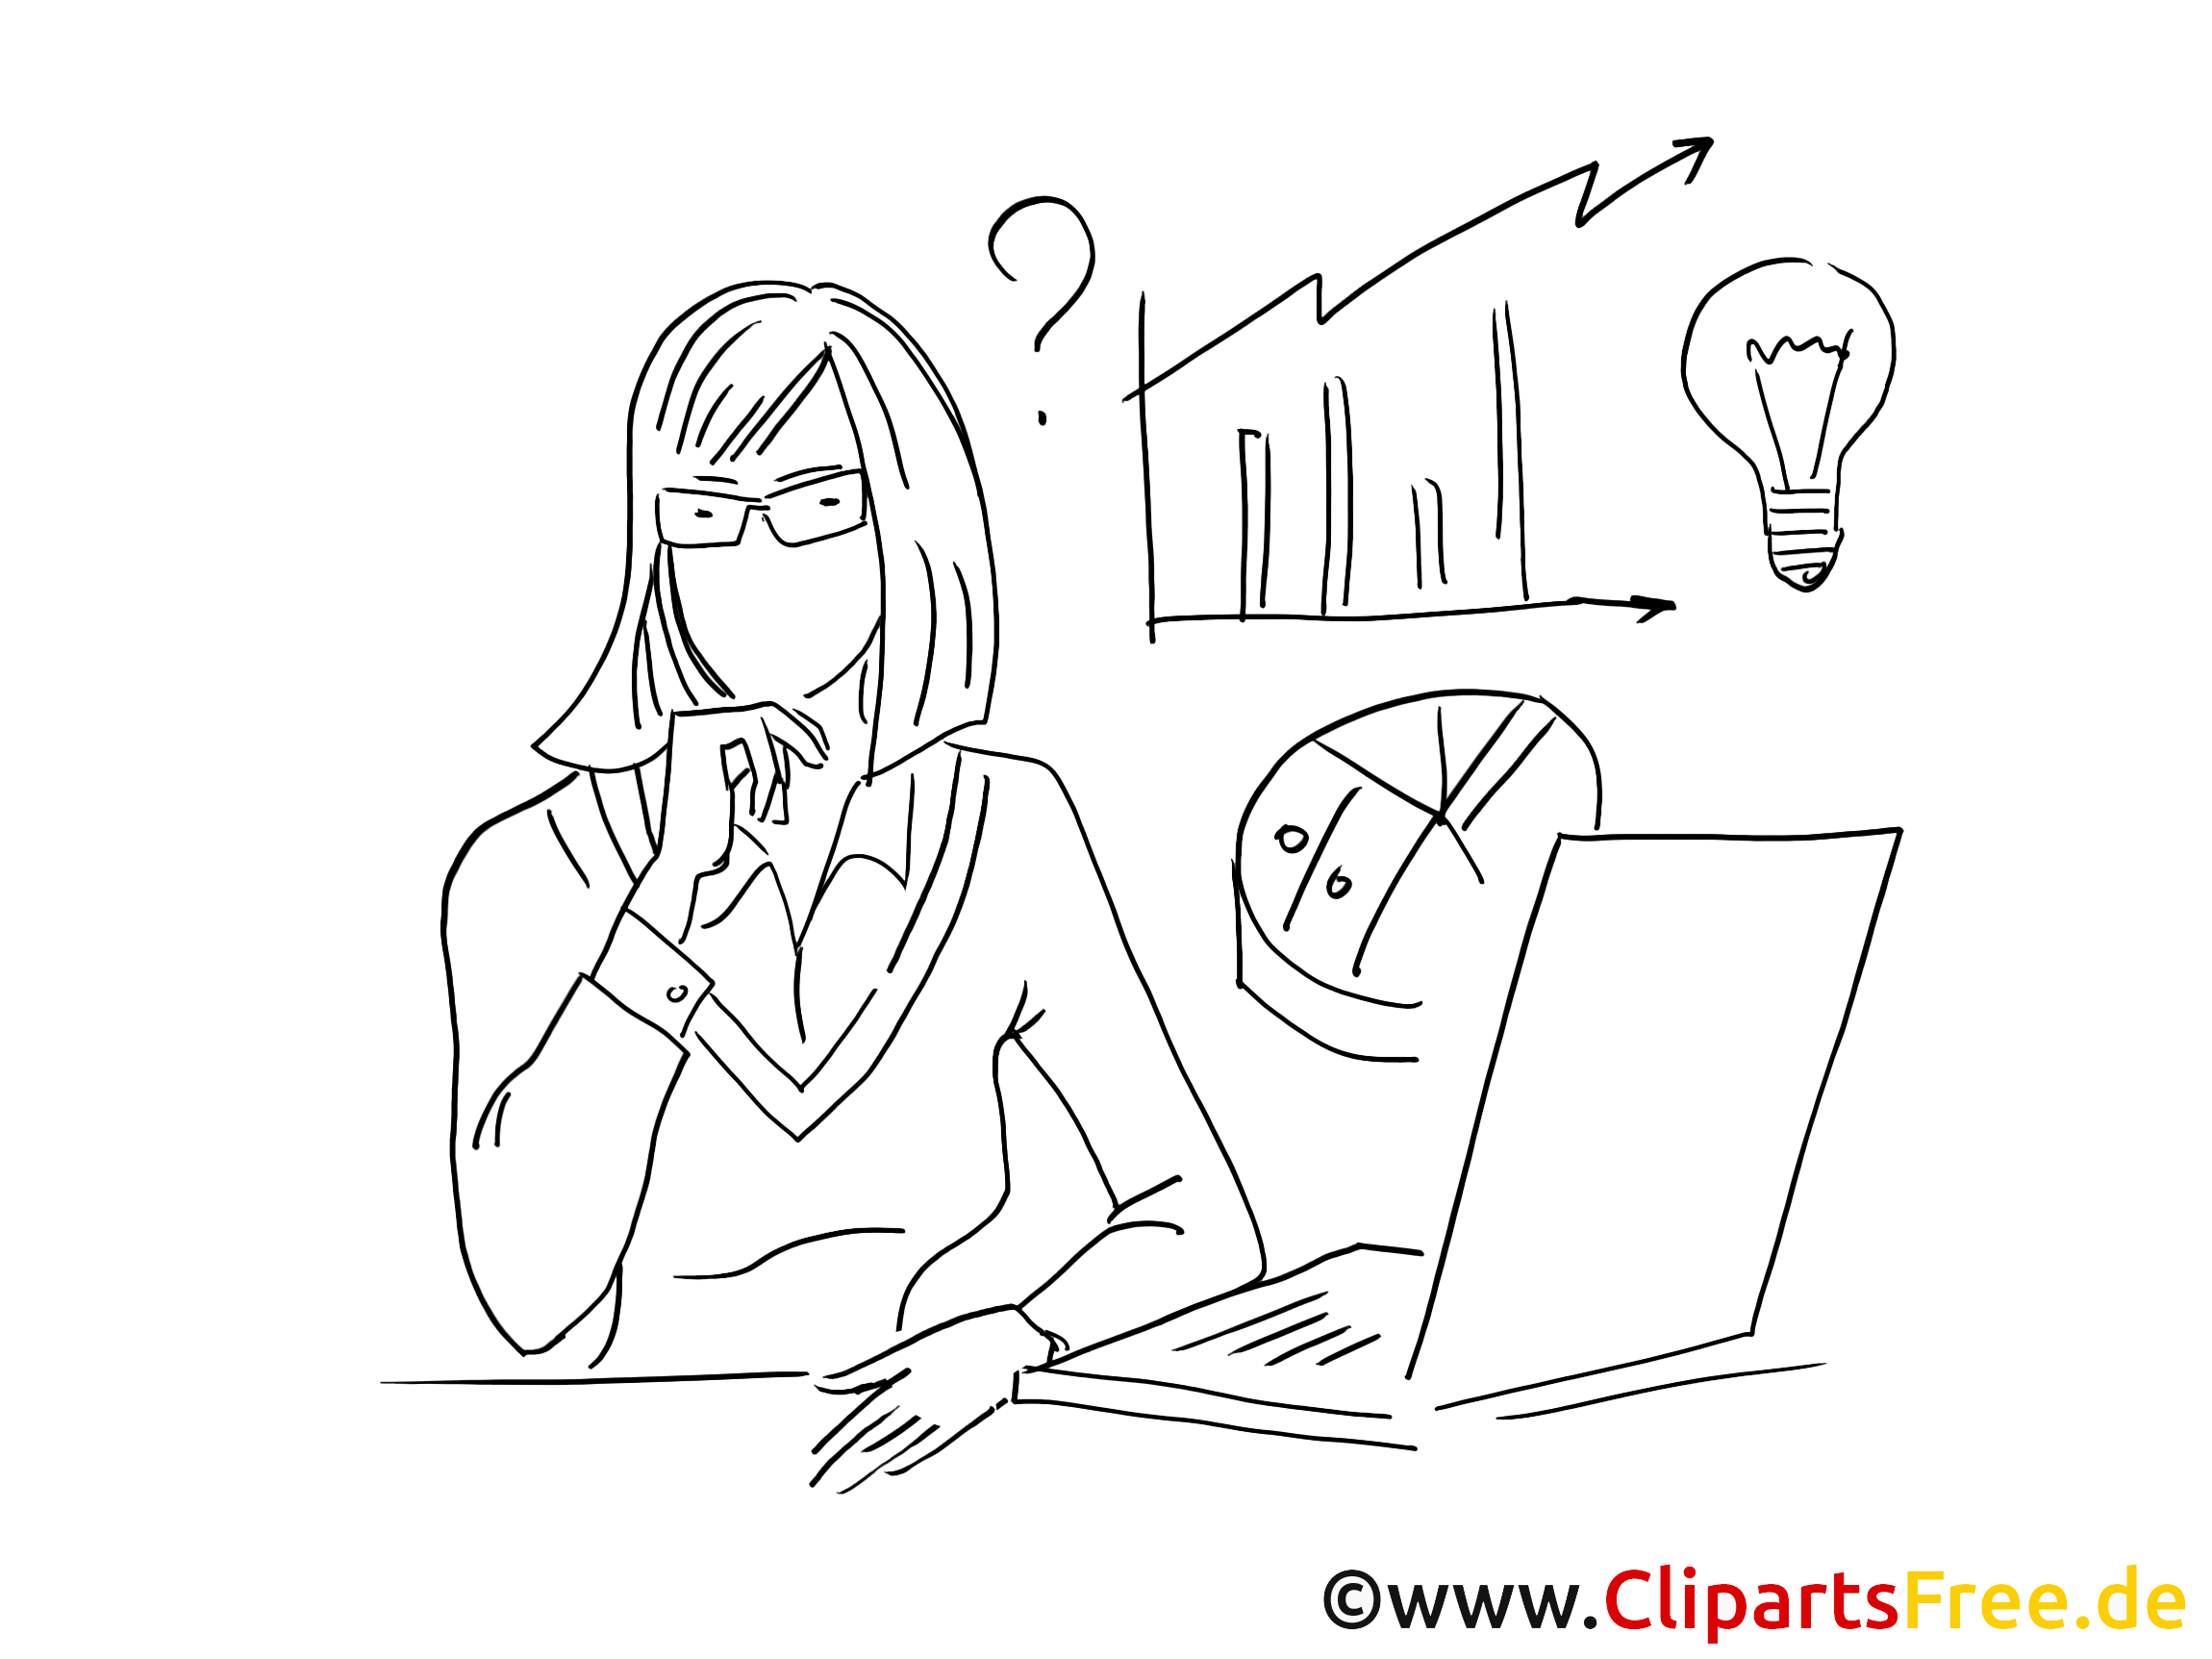 Bro frau clipart png freeuse stock Büro frau clipart - ClipartFest png freeuse stock